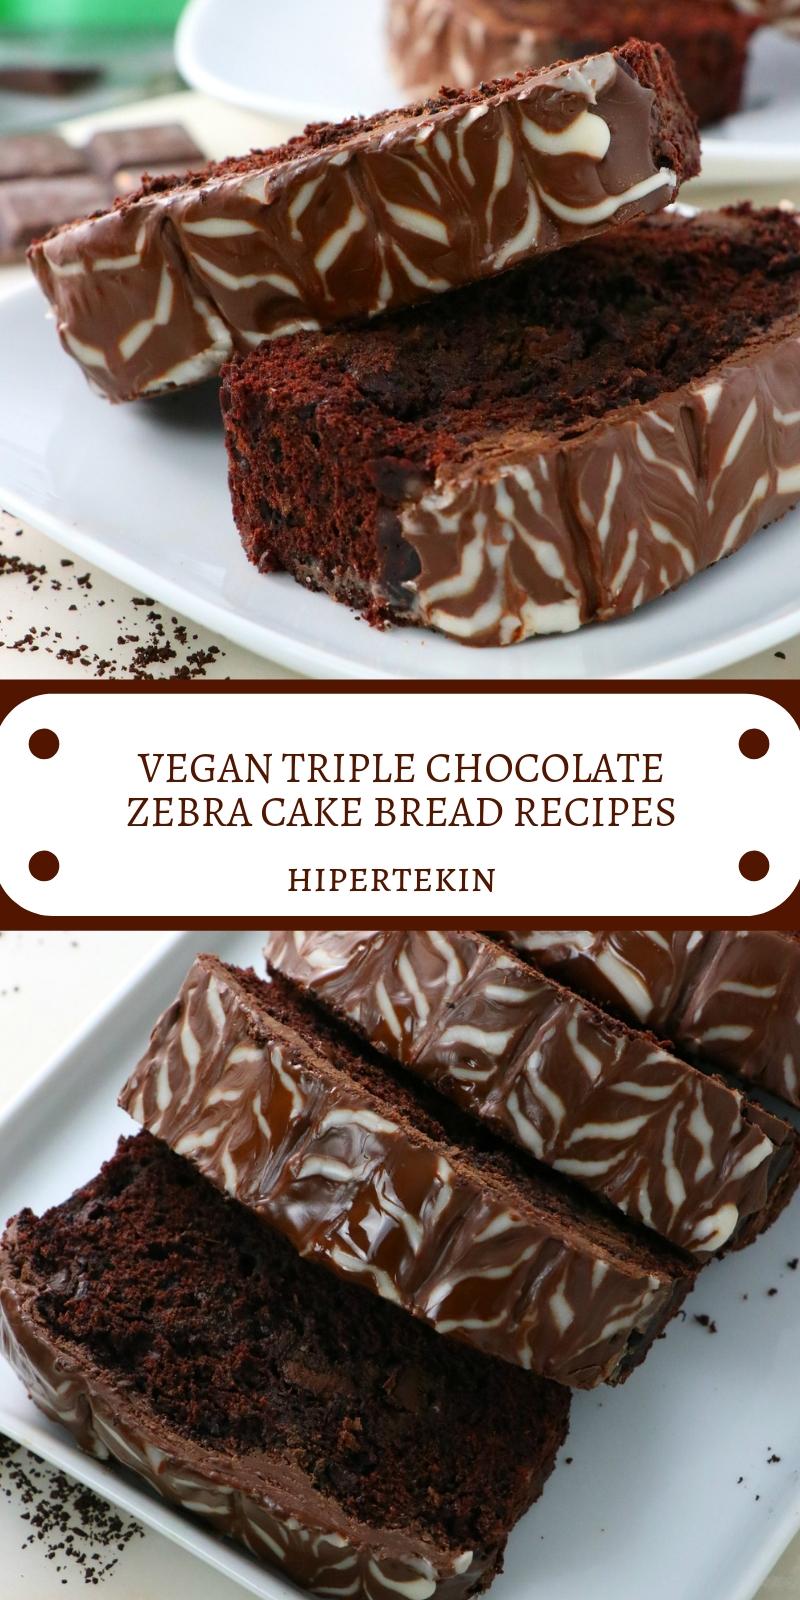 VEGAN TRIPLE CHOCOLATE ZEBRA CAKE BREAD RECIPES